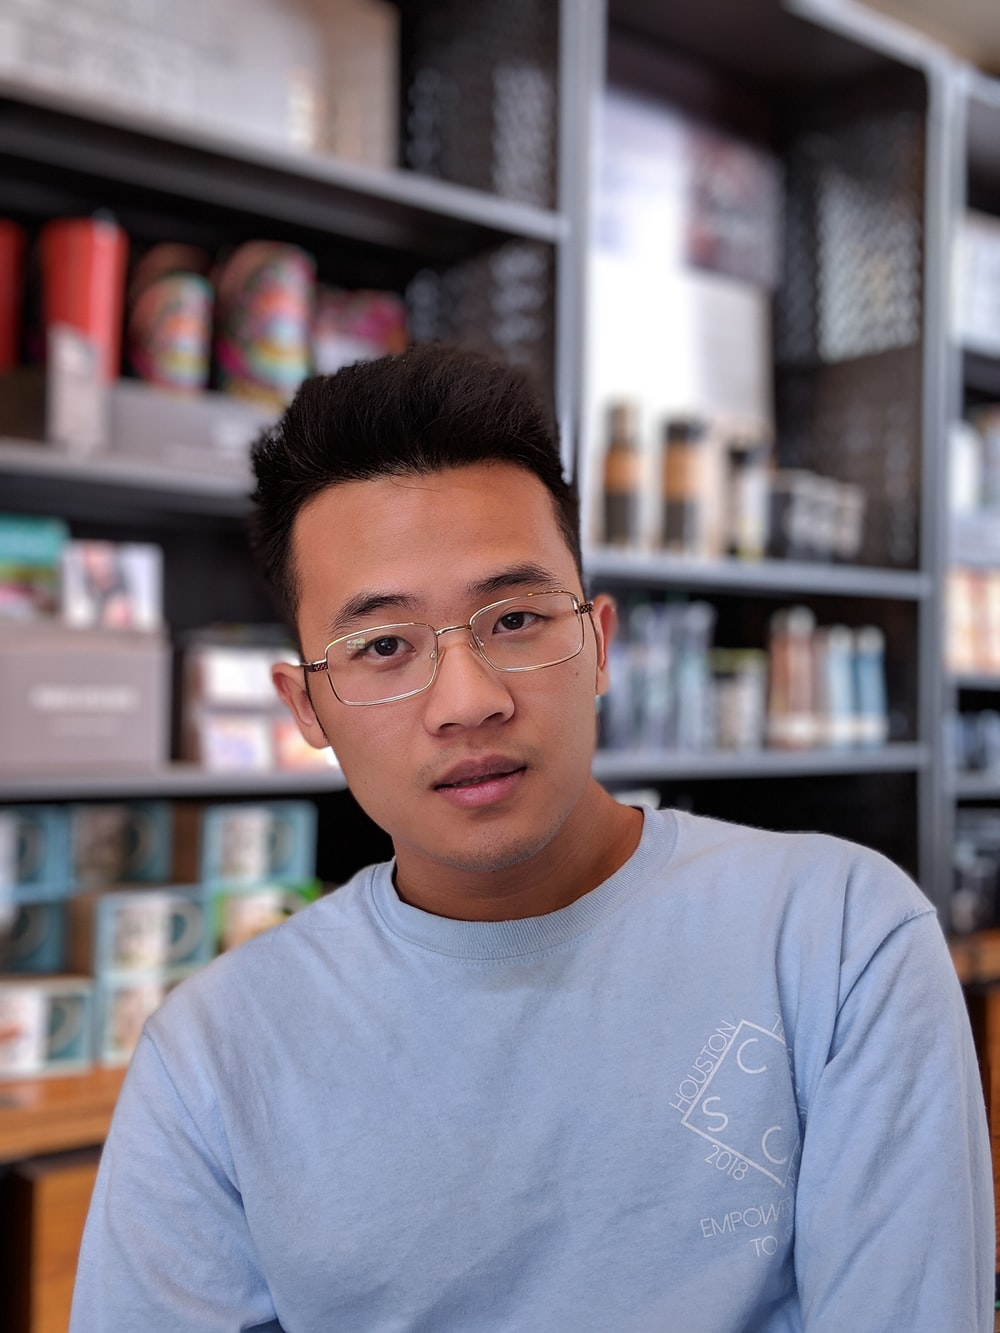 man wearing eyeglasses and blue shirt inside coffee shop